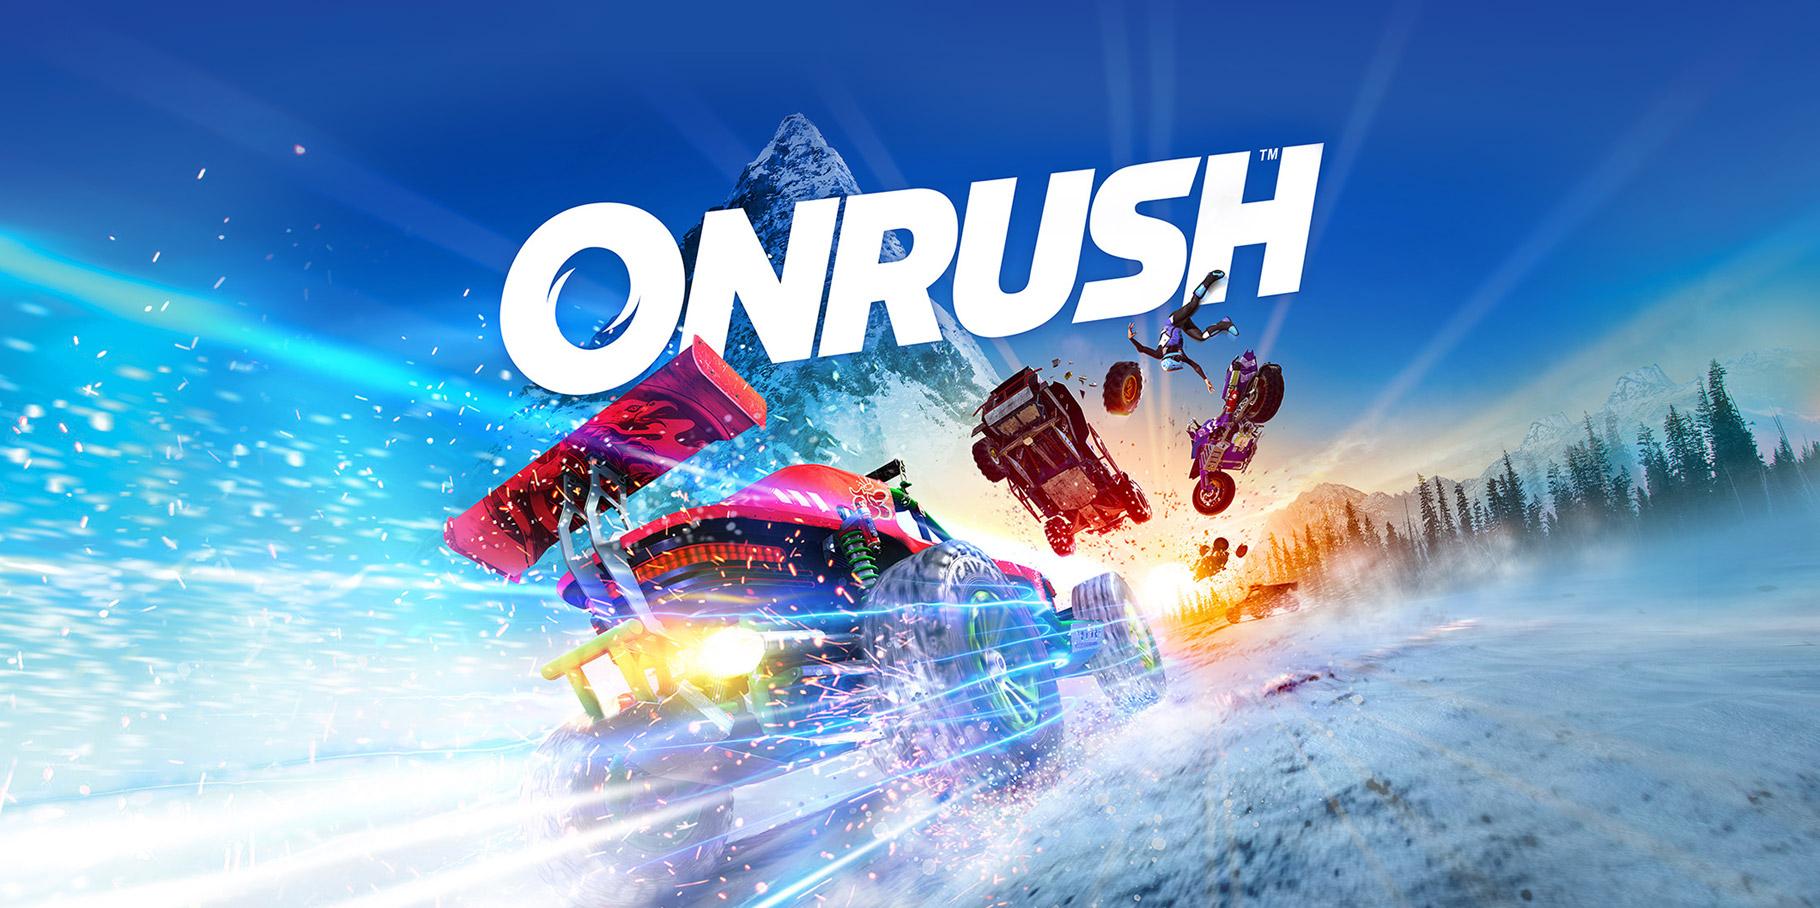 Onrush dit weekend gratis speelbaar @ PSN